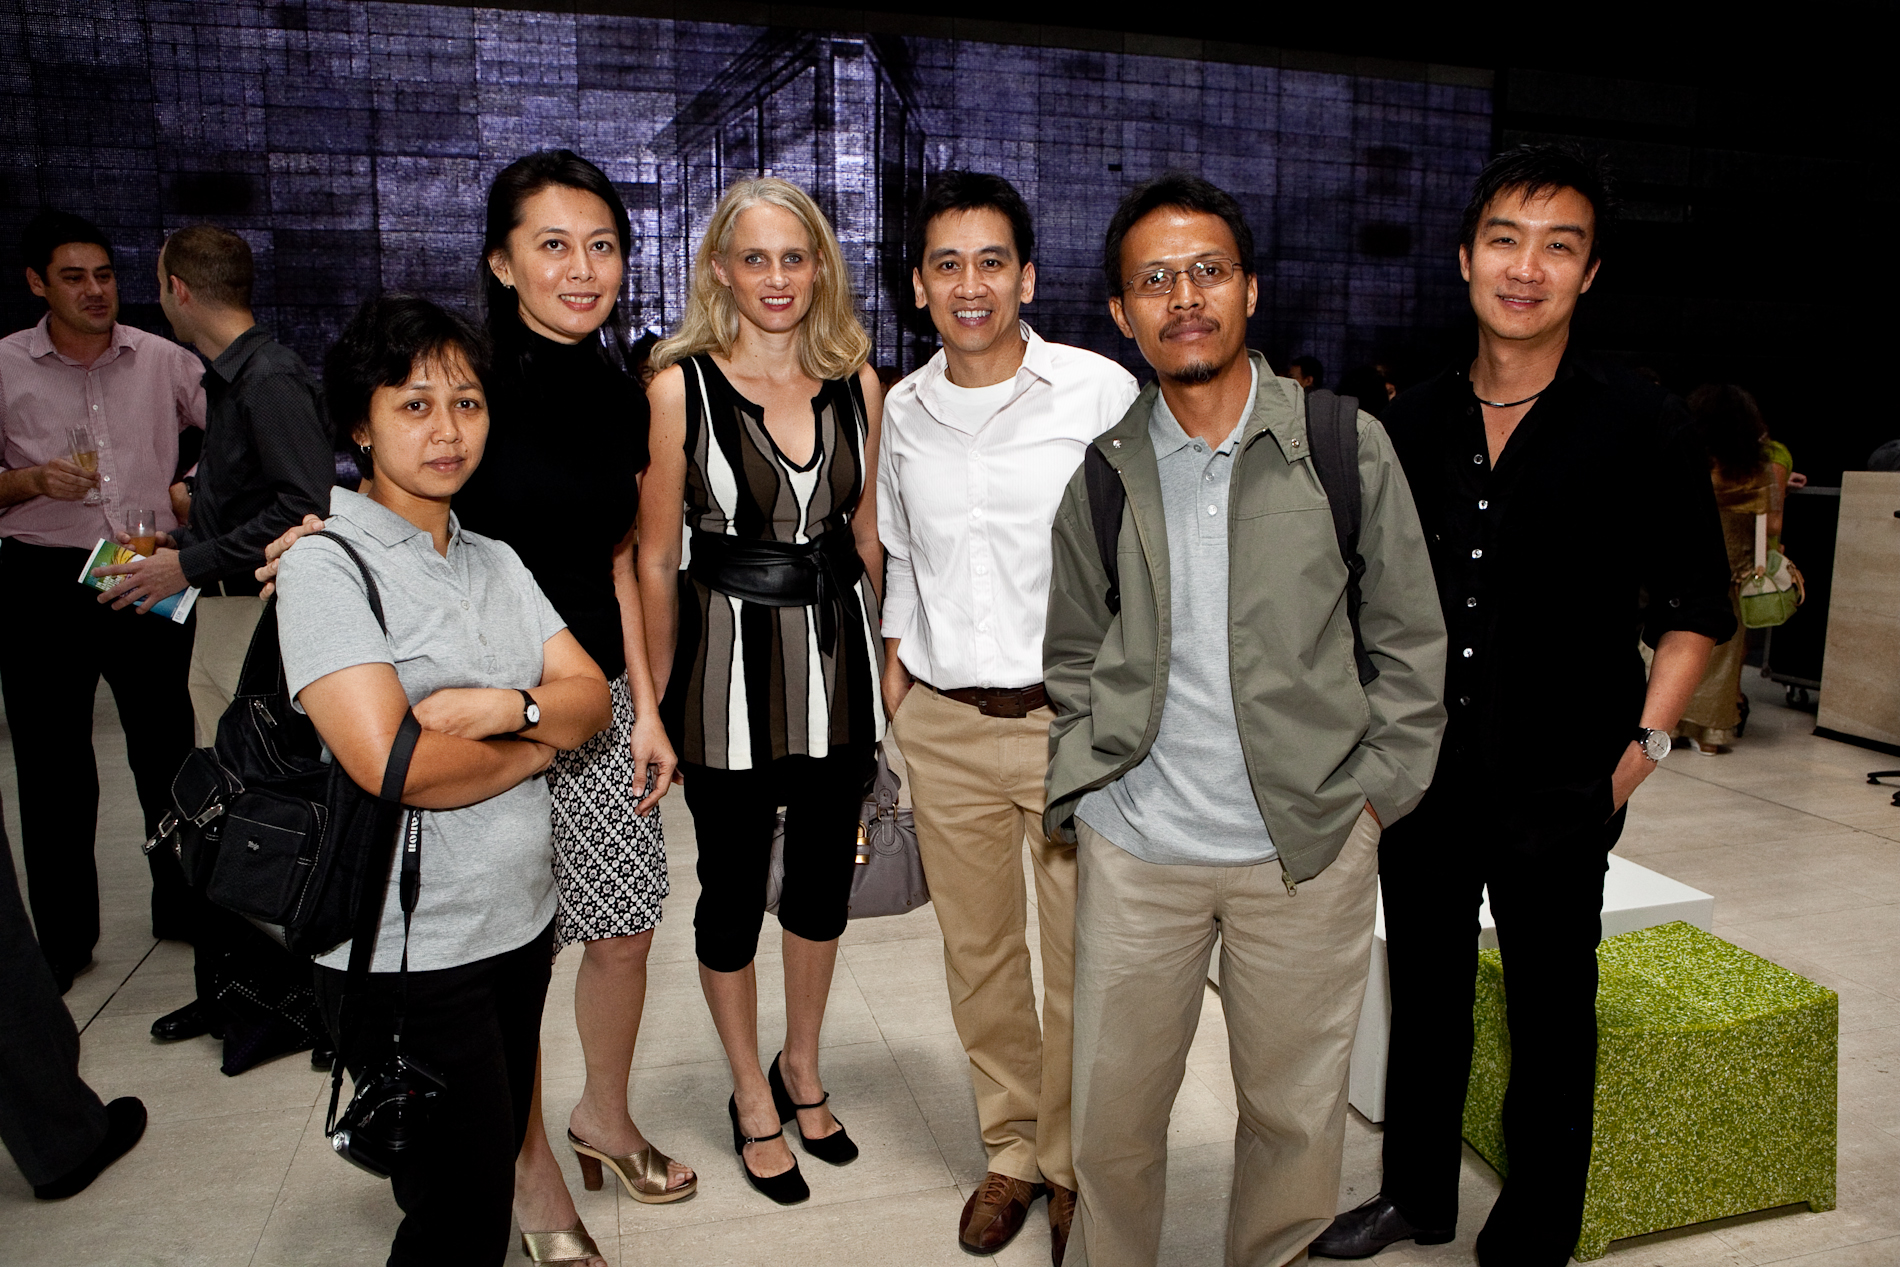 qi-global-2009-sustaible-design-singapore-041.jpg